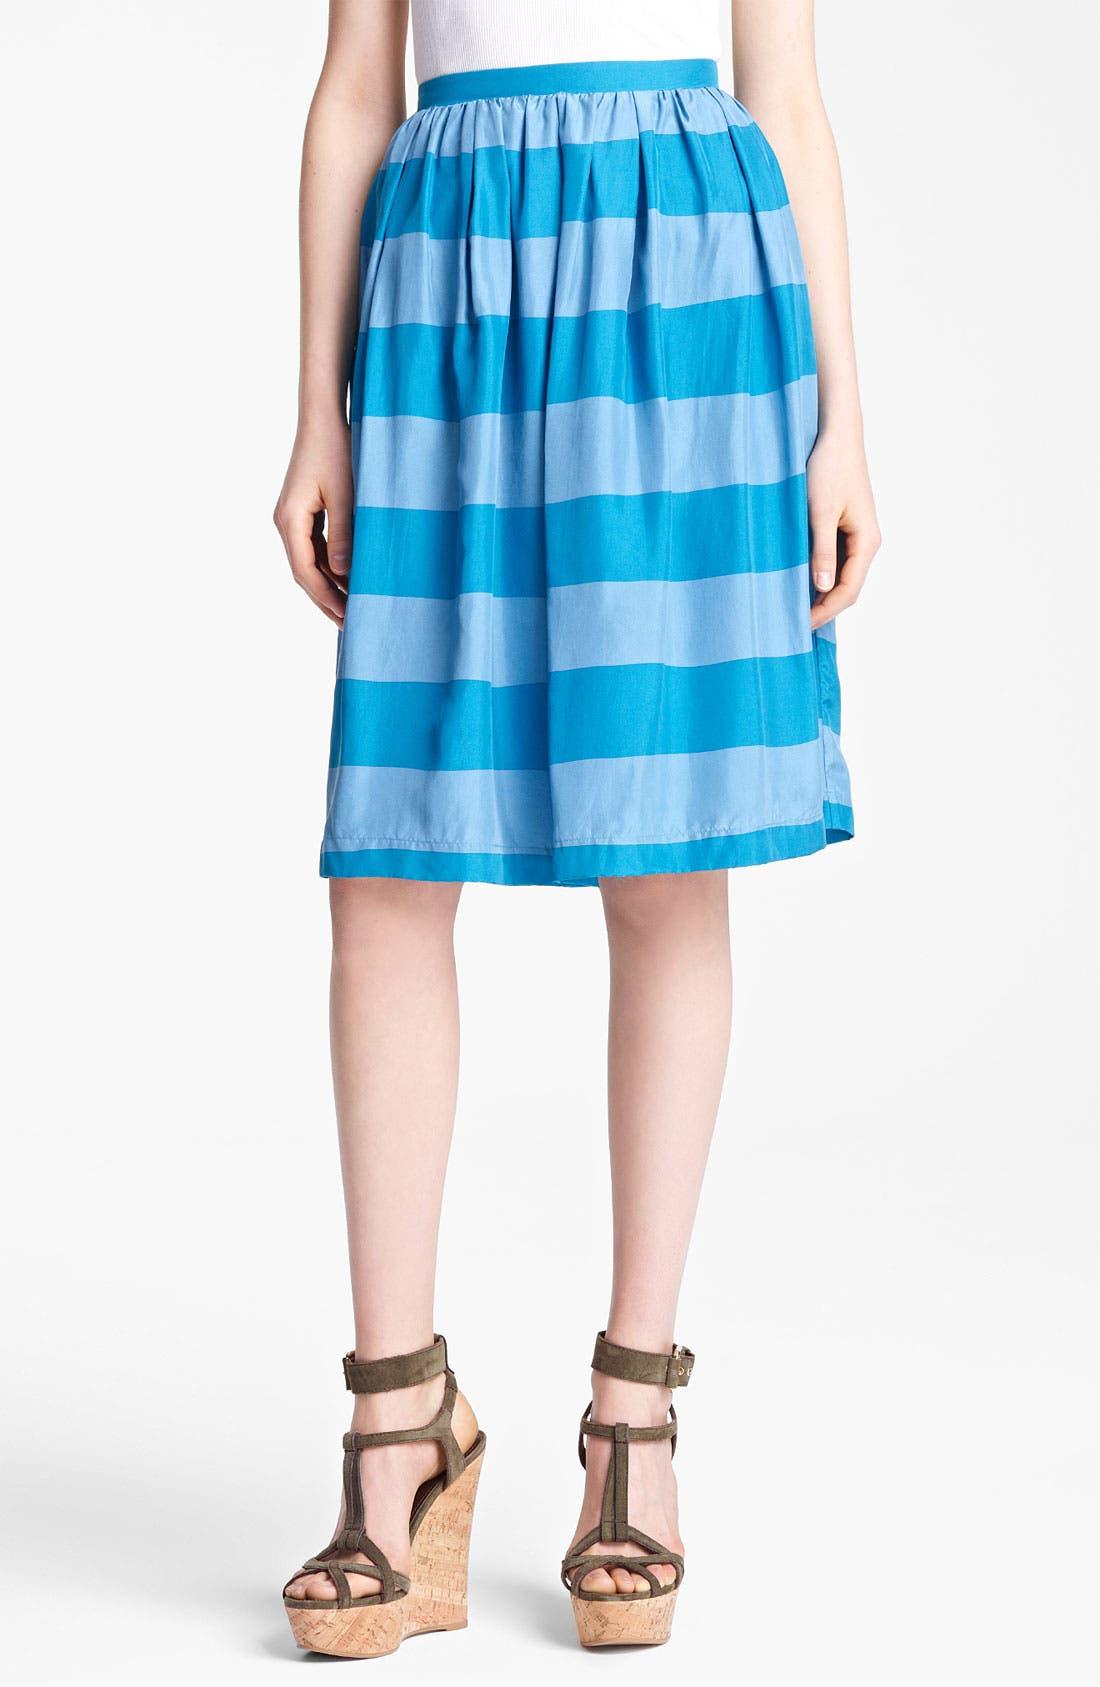 Alternate Image 1 Selected - Burberry Brit Stripe Silk Skirt (Online Only)